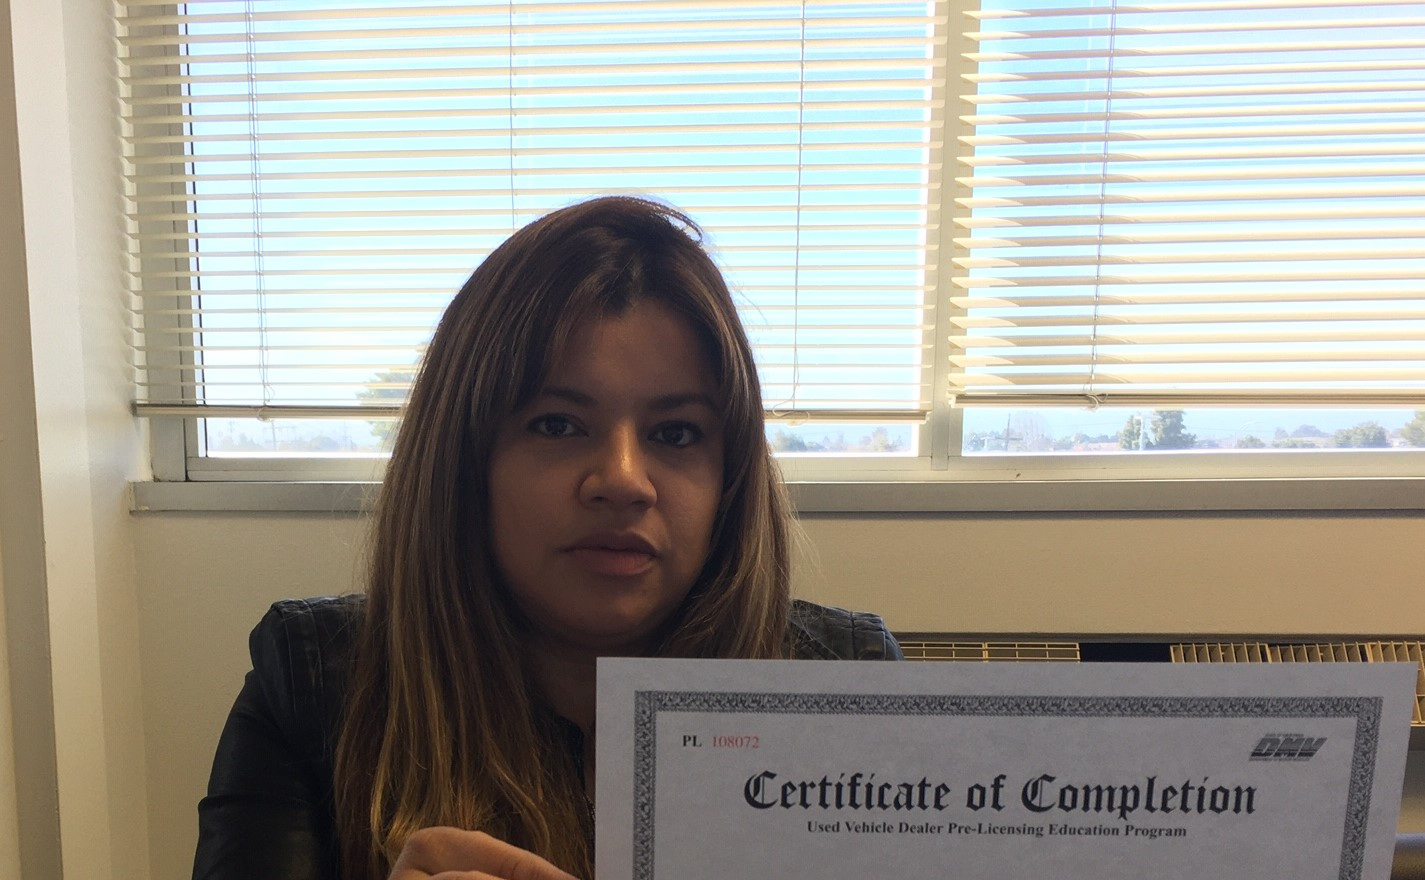 Pre licensing dealer testimonial. Certificate of completion